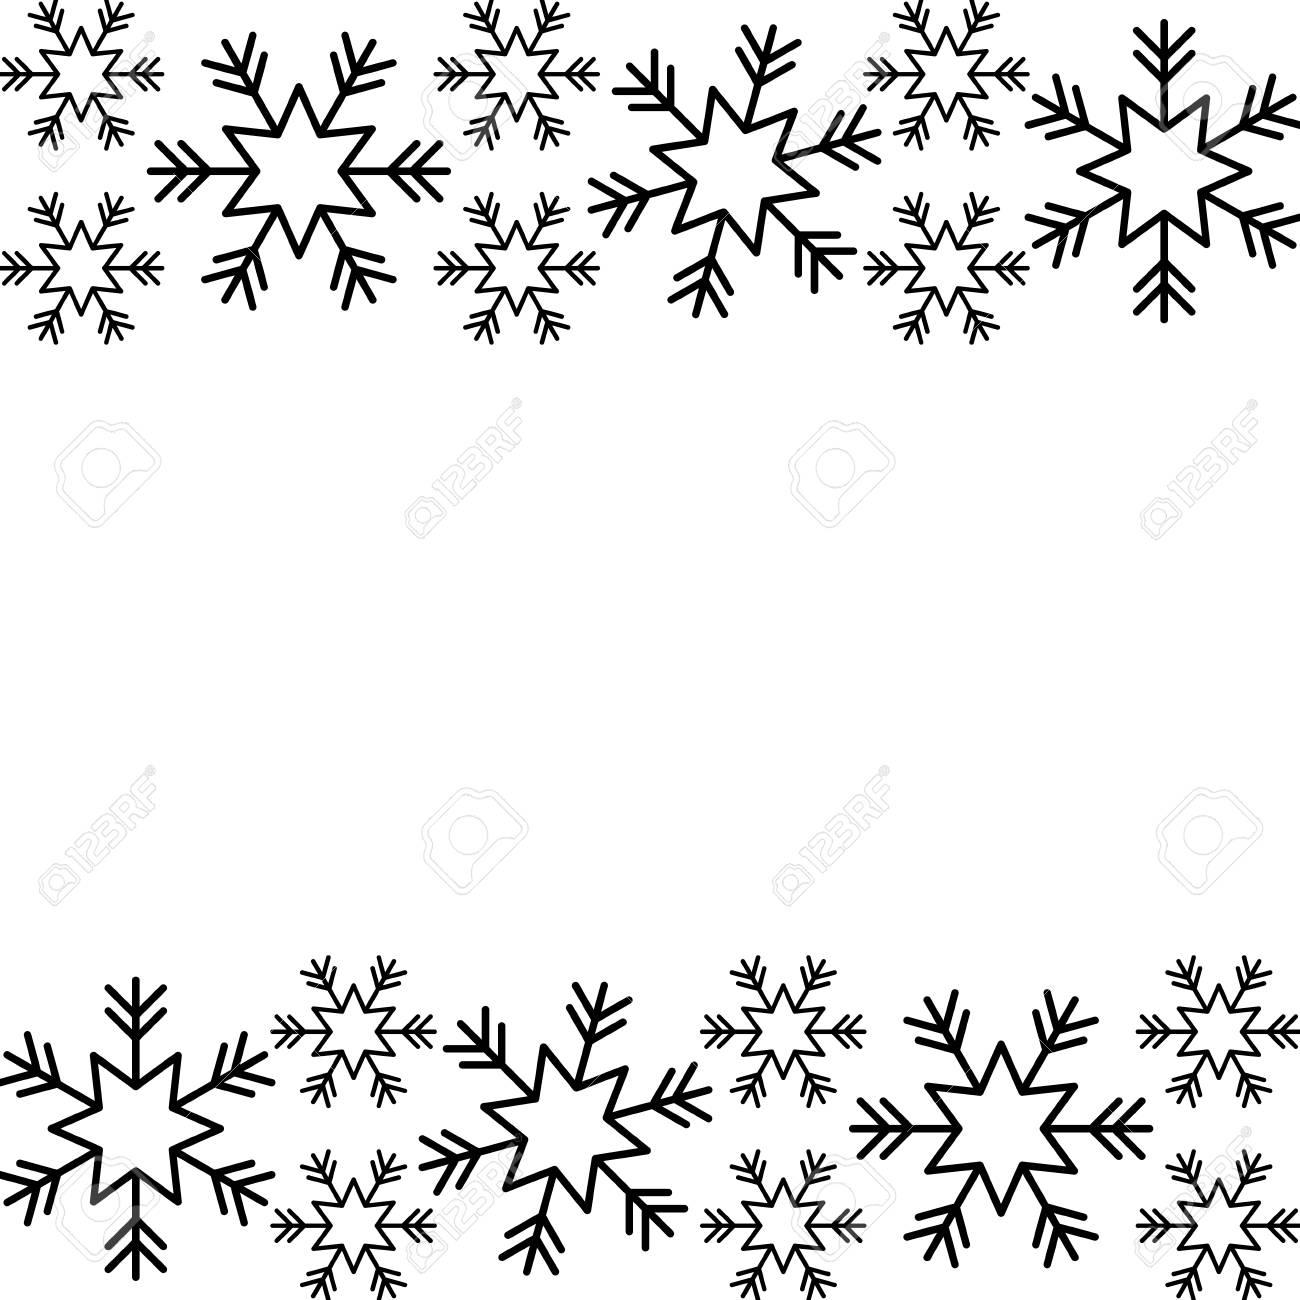 Snowflake Christmas Border Clipart Black And White.